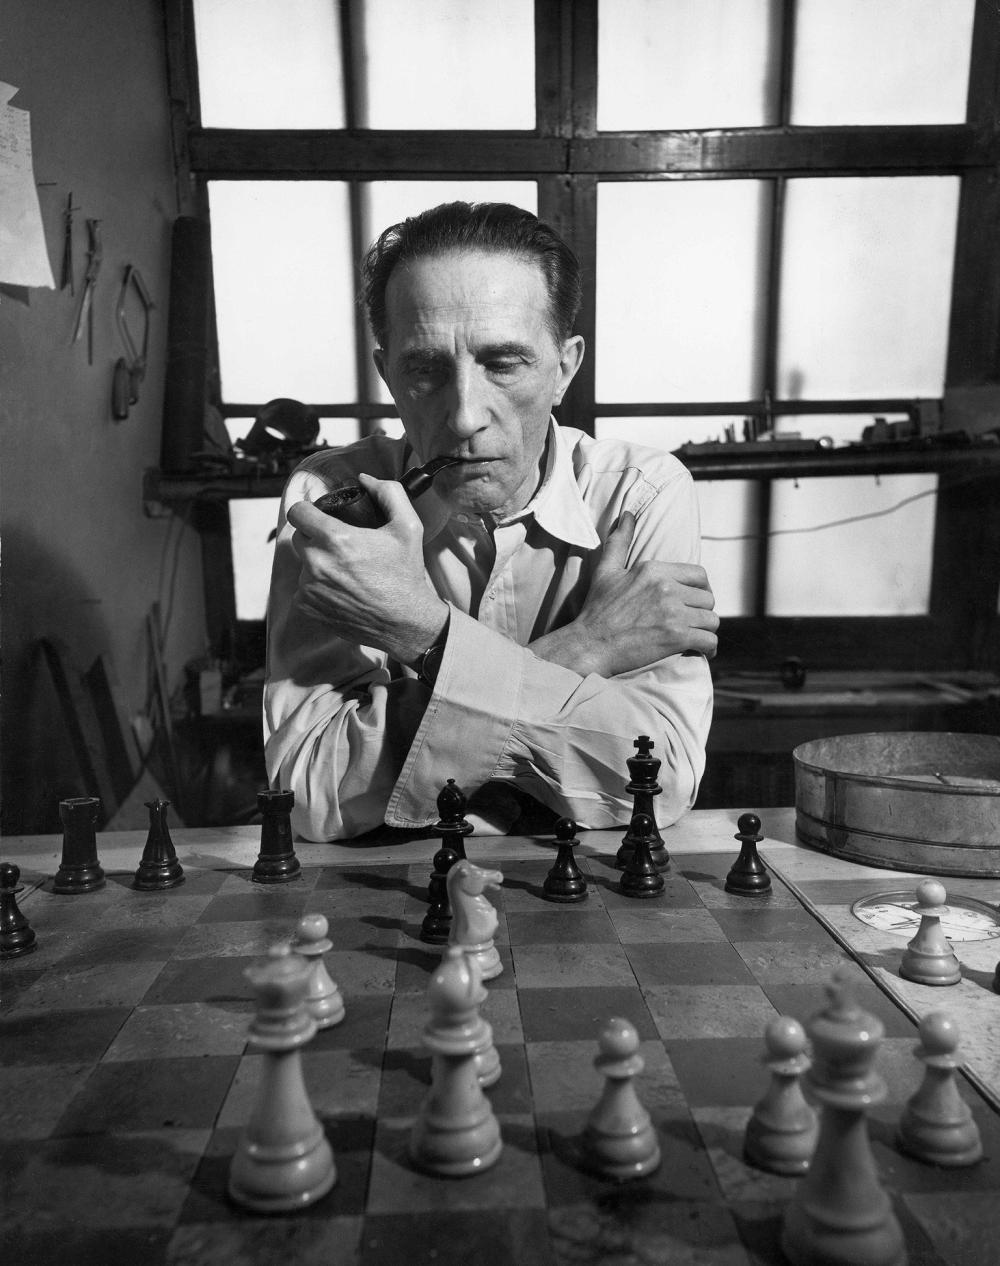 Eliot ELISOFON (1911-1973) Marcel Duchamp devant son jeu d'échec, jouant av